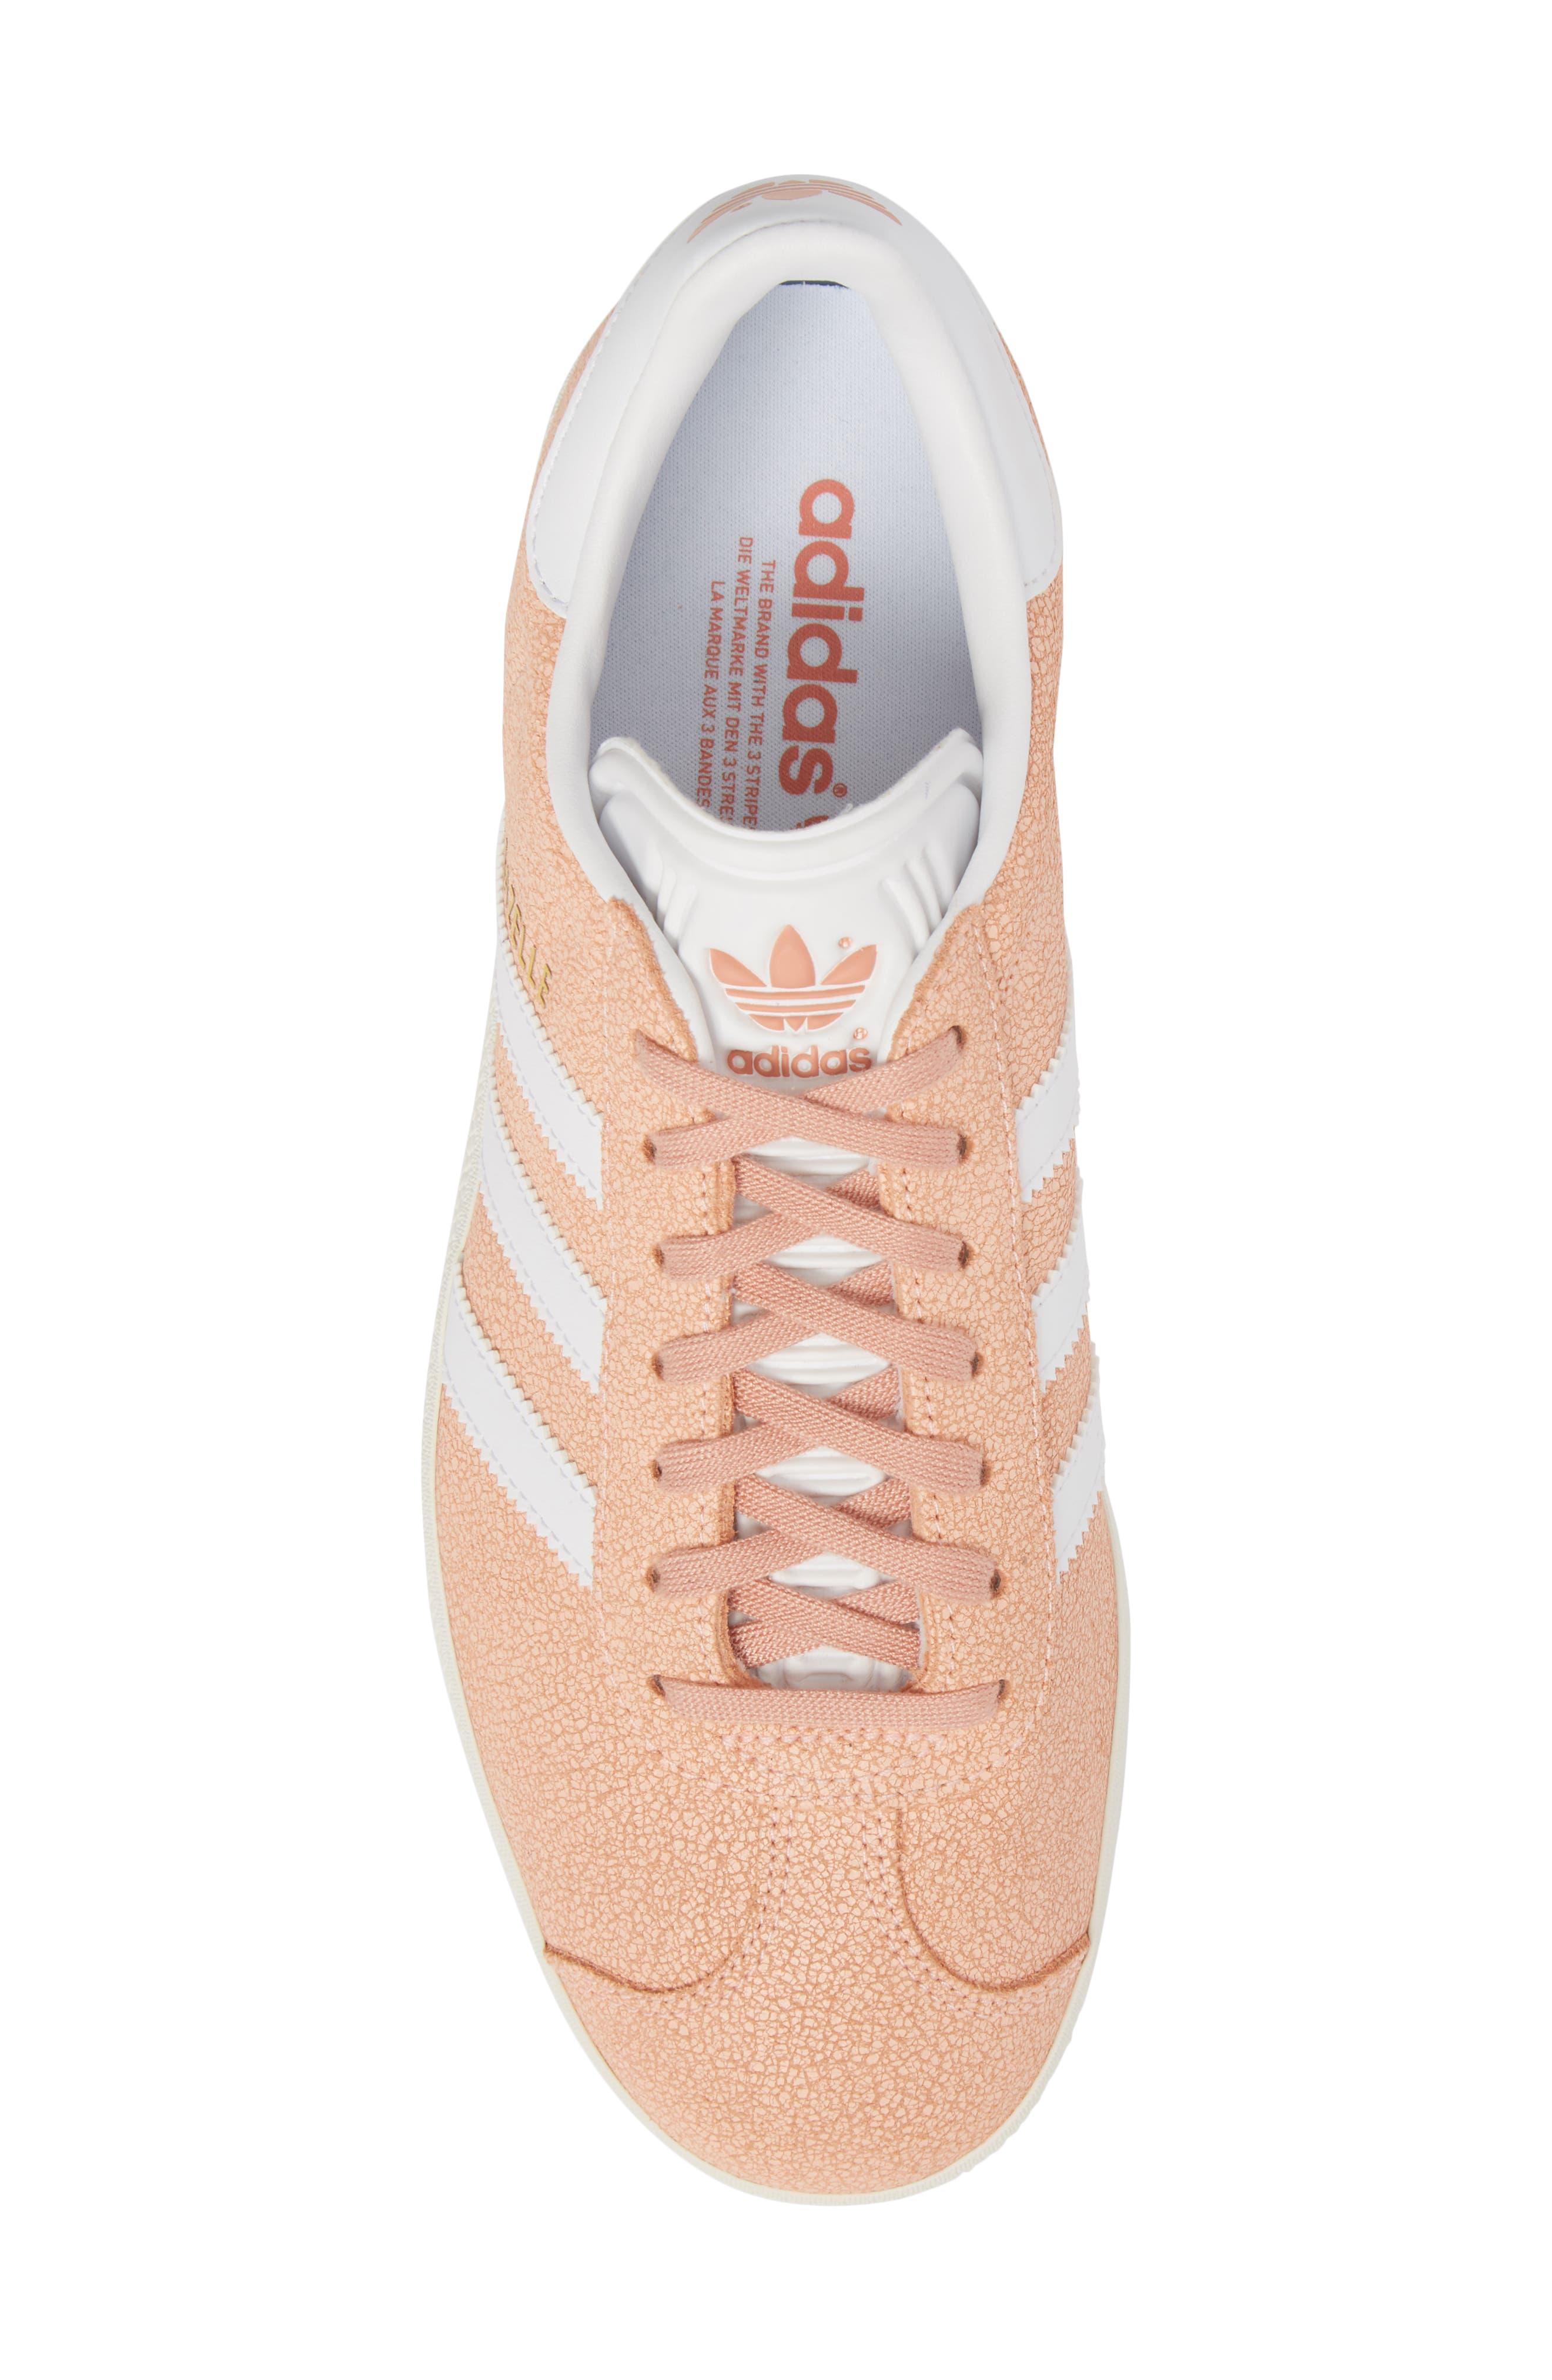 Gazelle Sneaker,                             Alternate thumbnail 5, color,                             Clear Orange/ White/ Off White